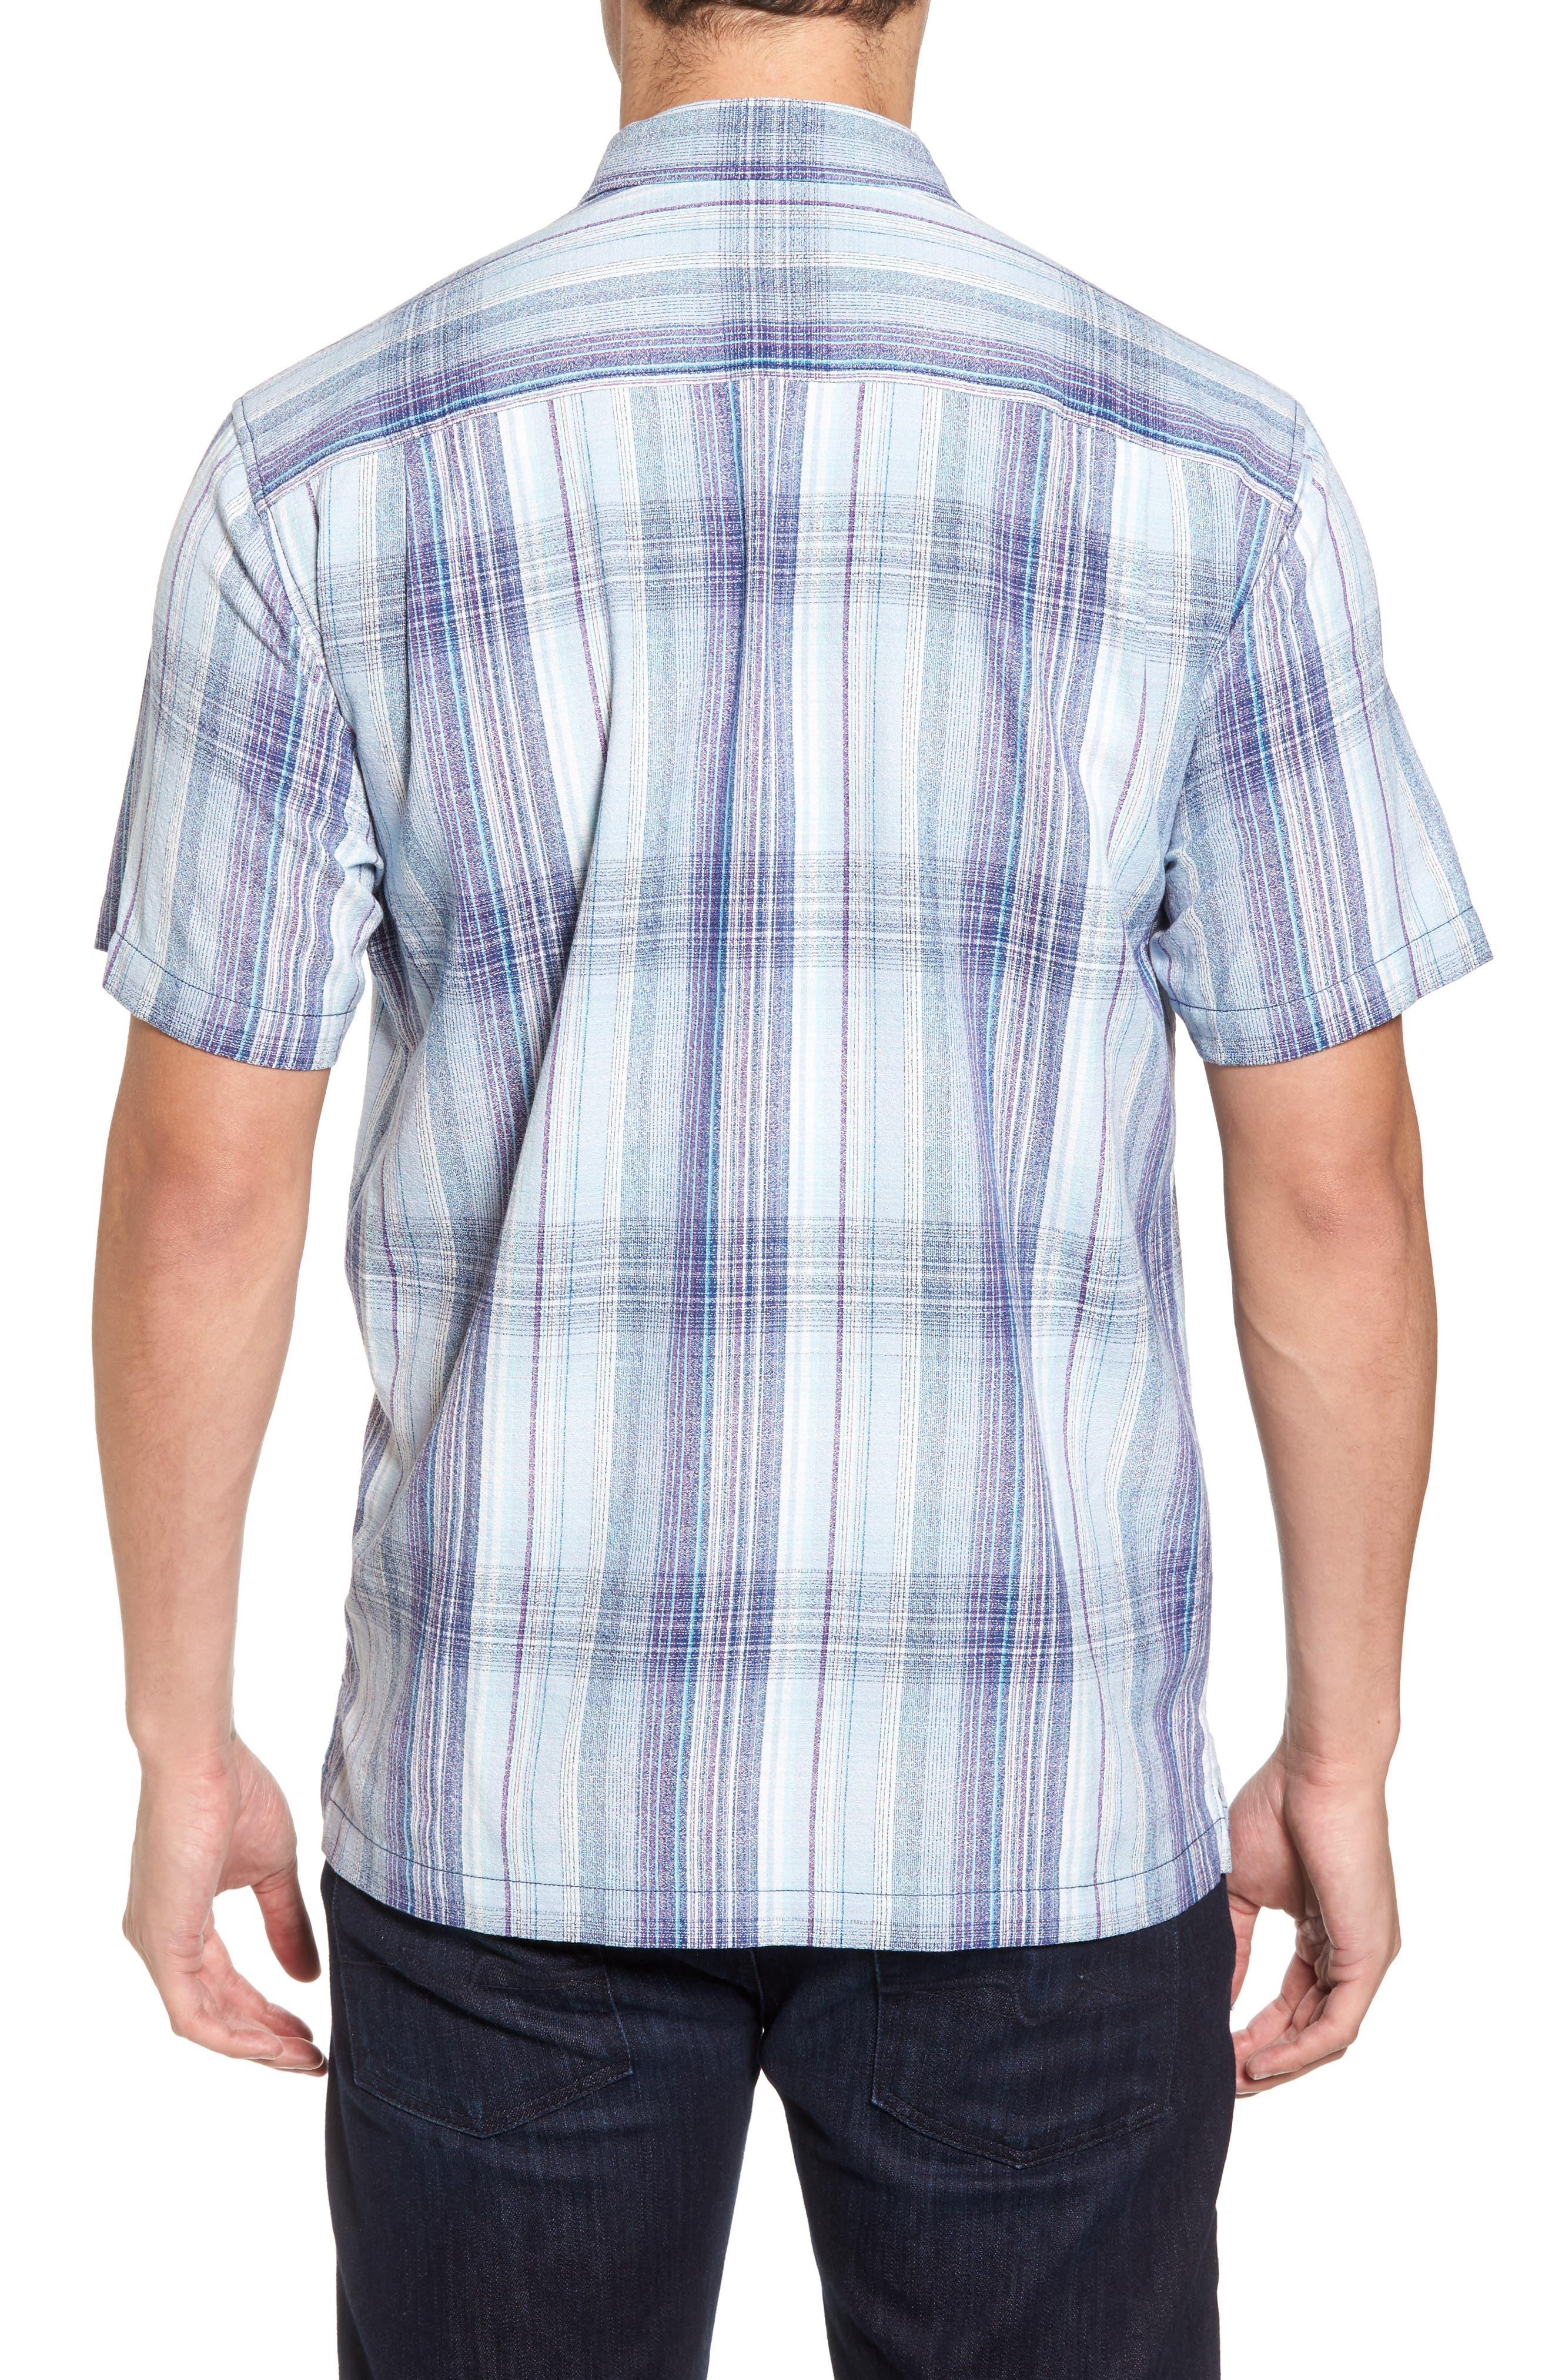 Banyan Cay Plaid Silk Blend Camp Shirt,                             Alternate thumbnail 2, color,                             Dockside Blue